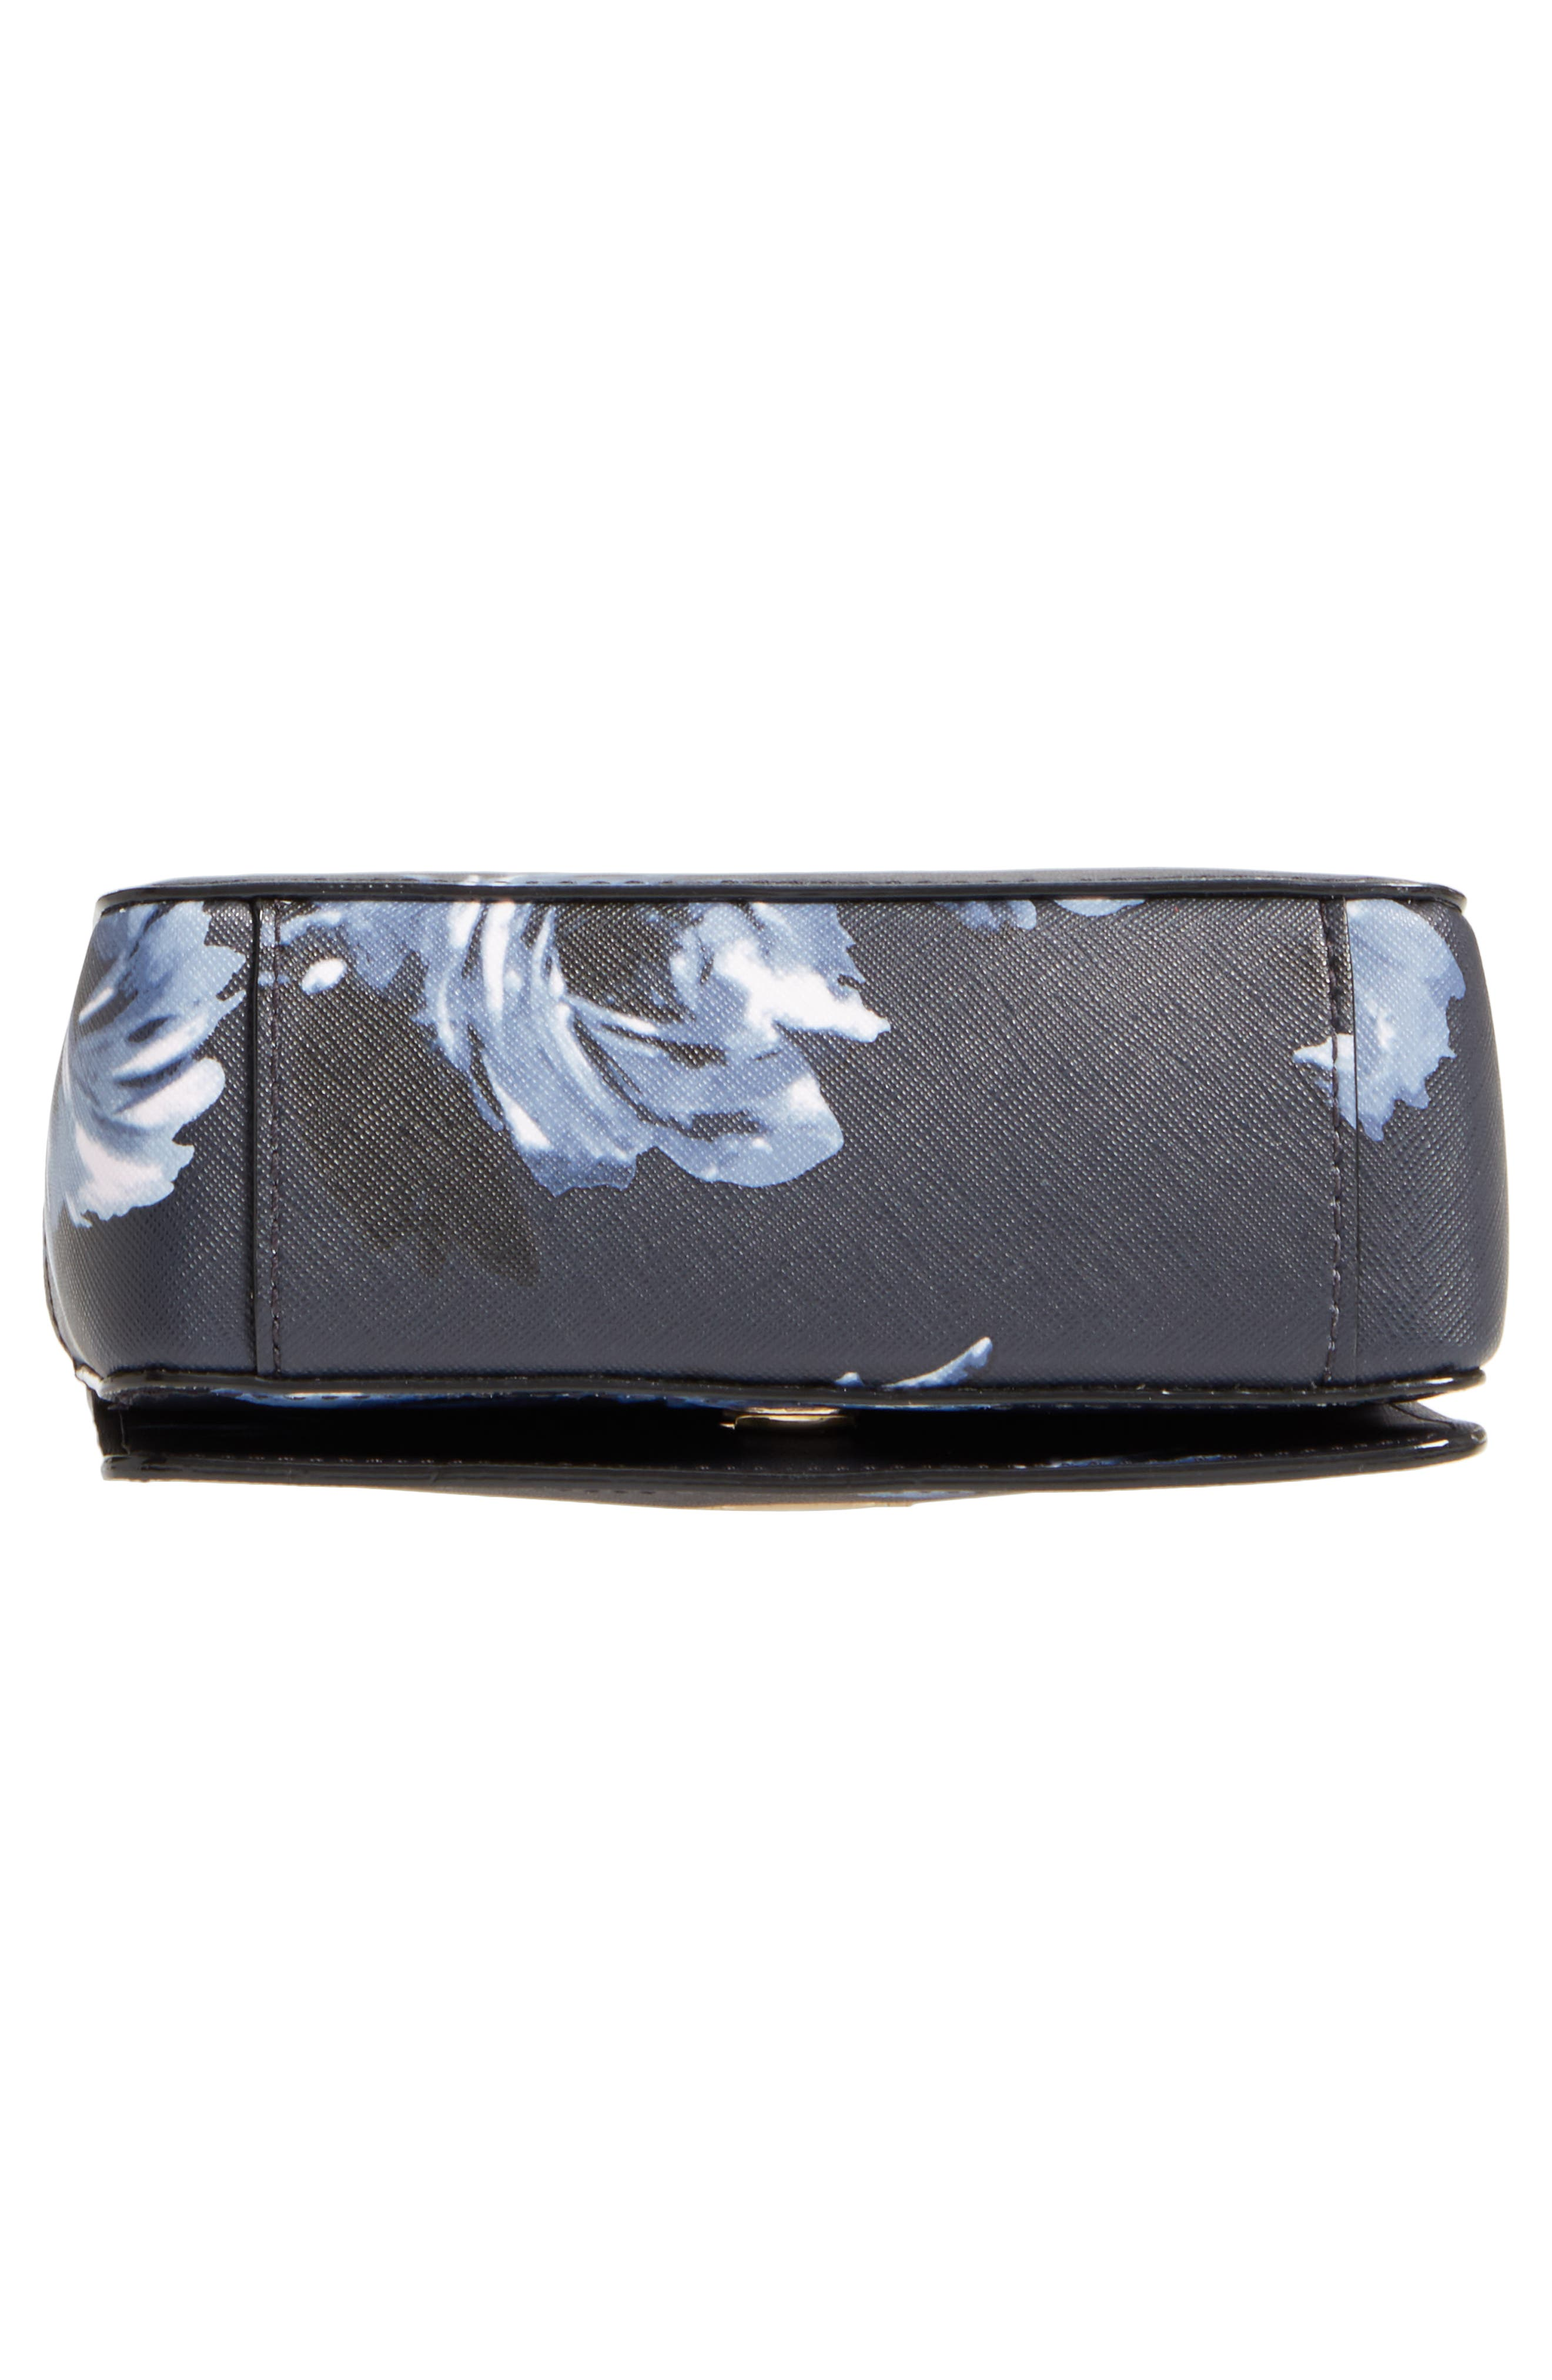 cameron street rose - hope leather crossbody bag,                             Alternate thumbnail 6, color,                             Rich Navy Multi